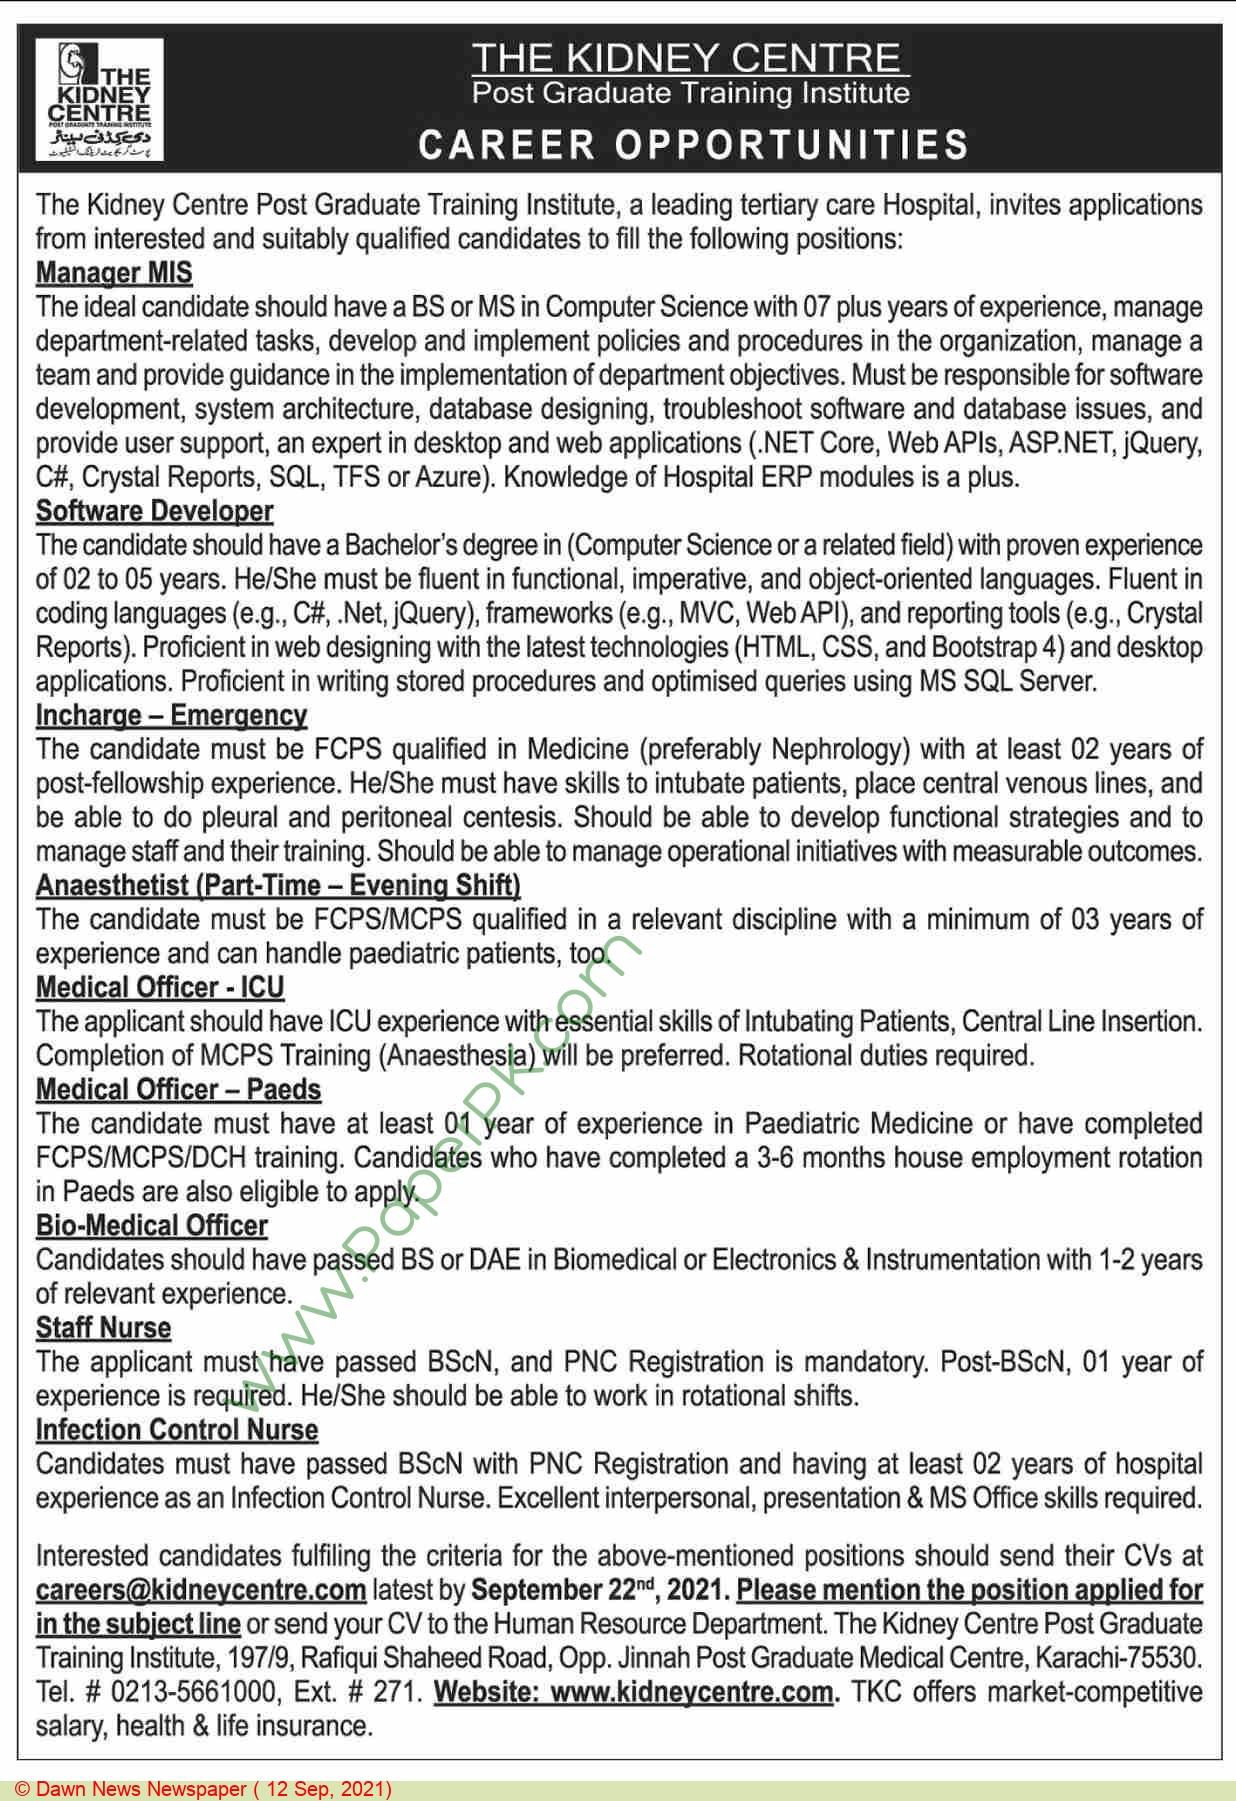 The Kidney Centre Postgraduate Training Institute jobs newspaper ad for Software Developer in Karachi on 2021-09-12